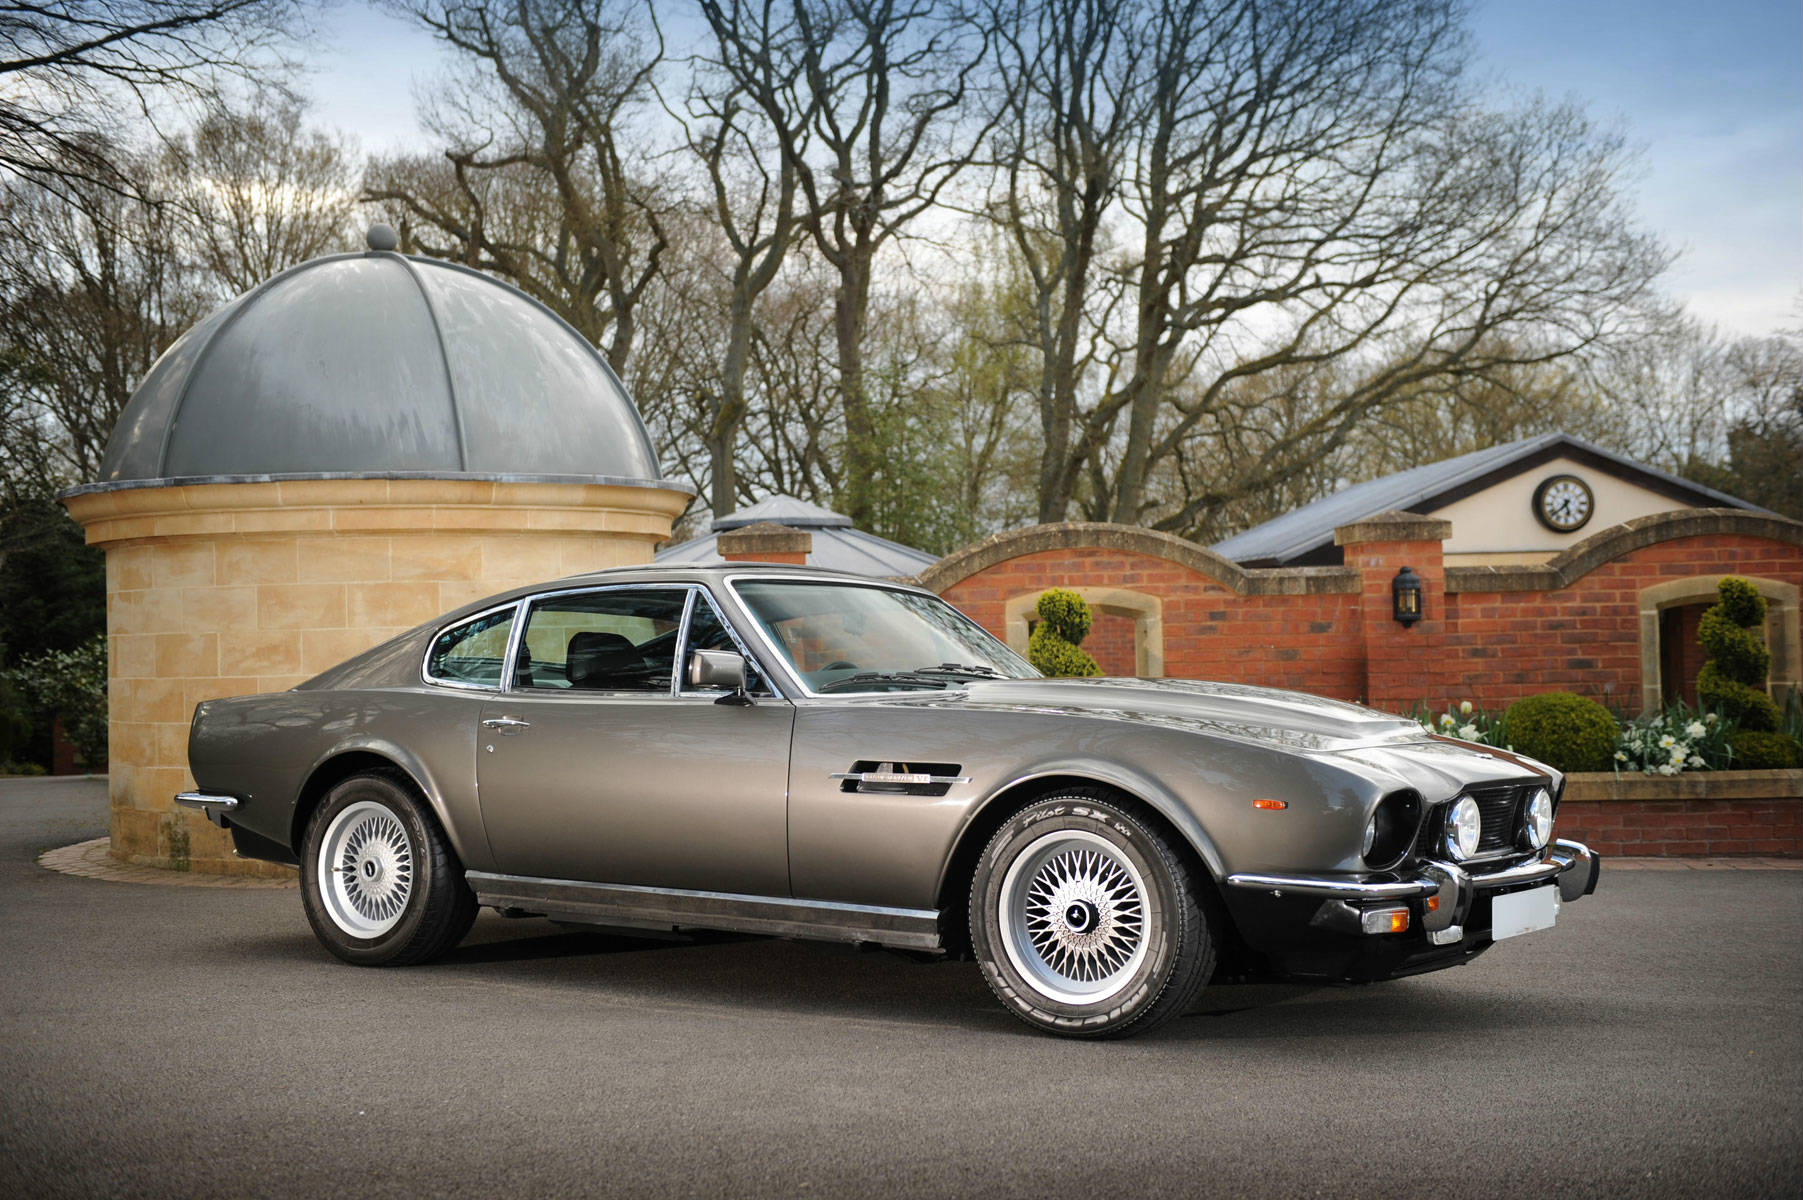 Top 10 Best James Bond Cars Must See Incredible Power